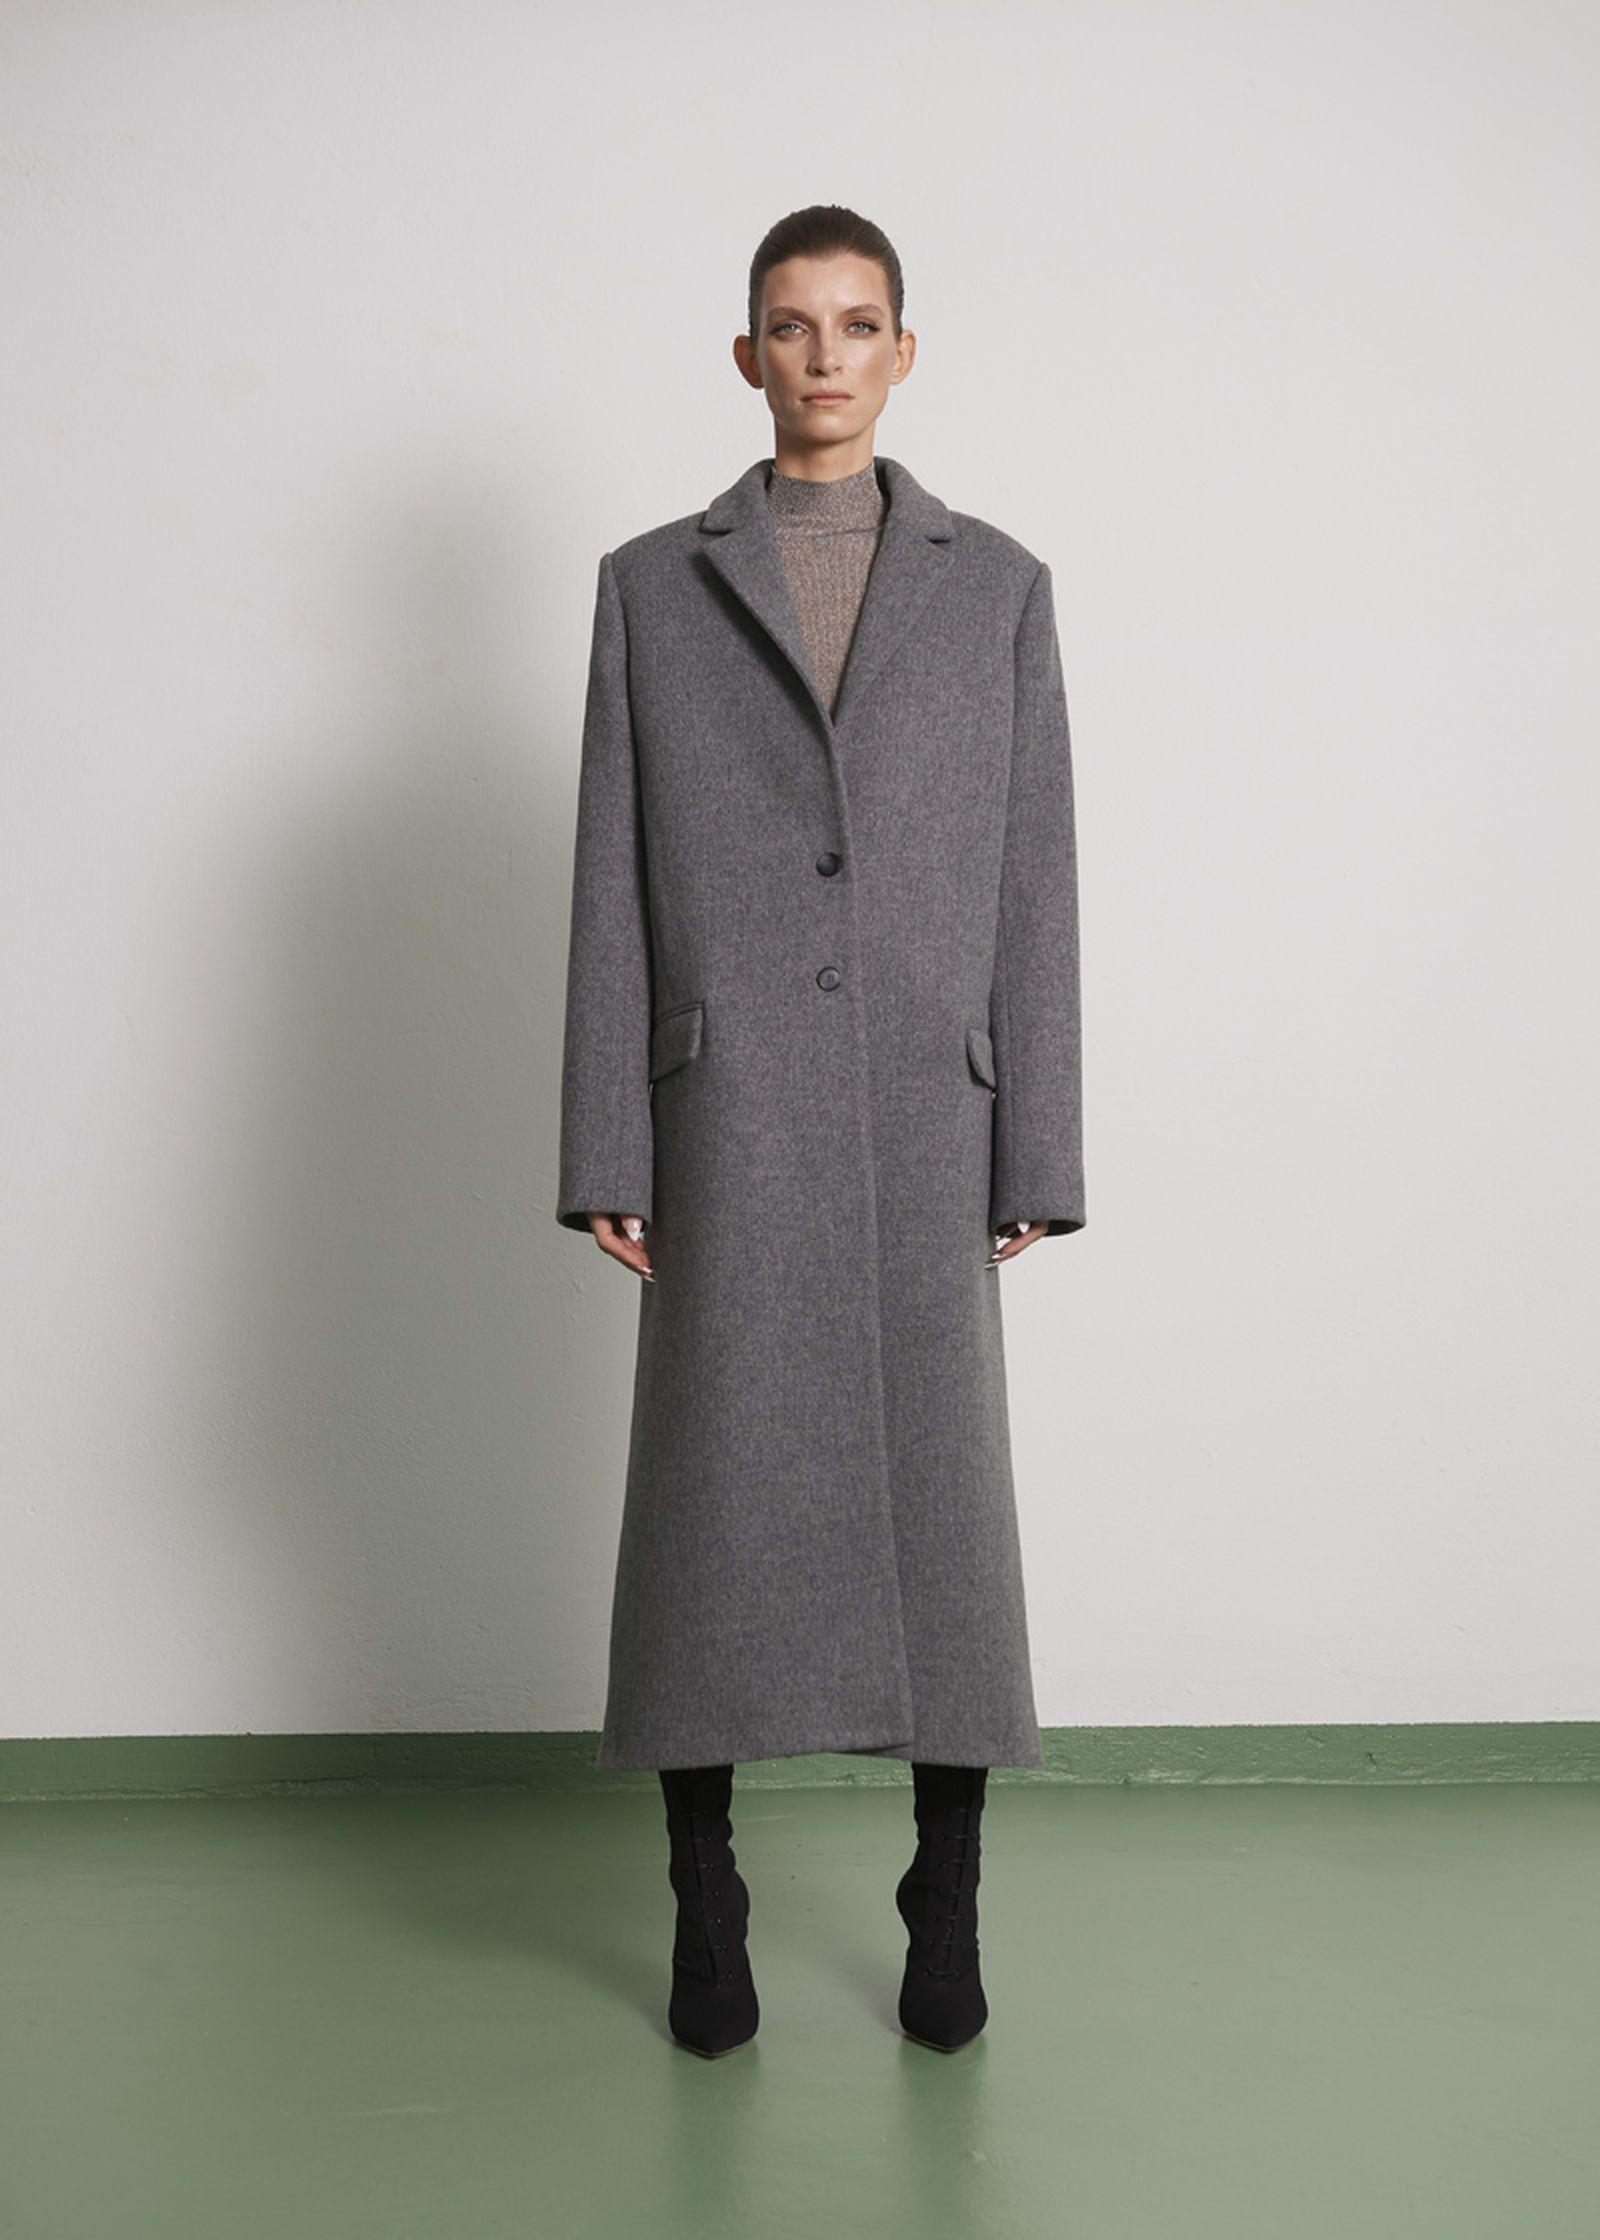 032c-rtw-womenswear-collection-paris-18